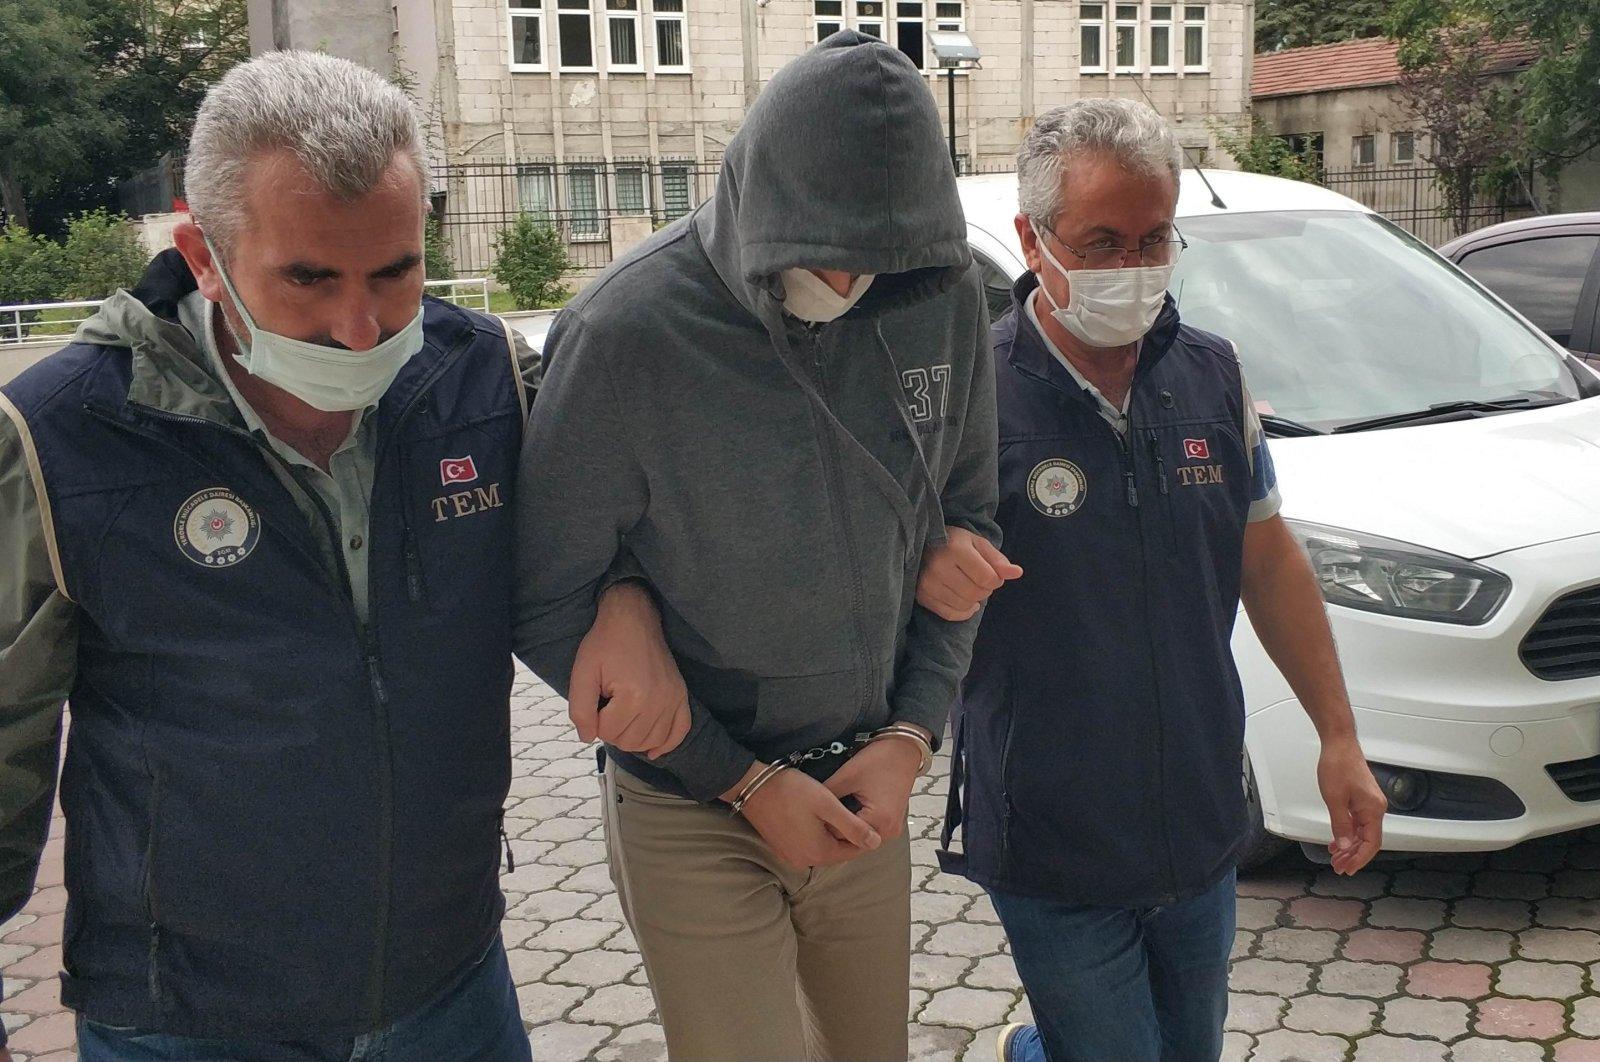 Police escort a FETÖ suspect to a courthouse, in western Denizli province, Turkey, Sept. 24, 2021. (İHA Photo)